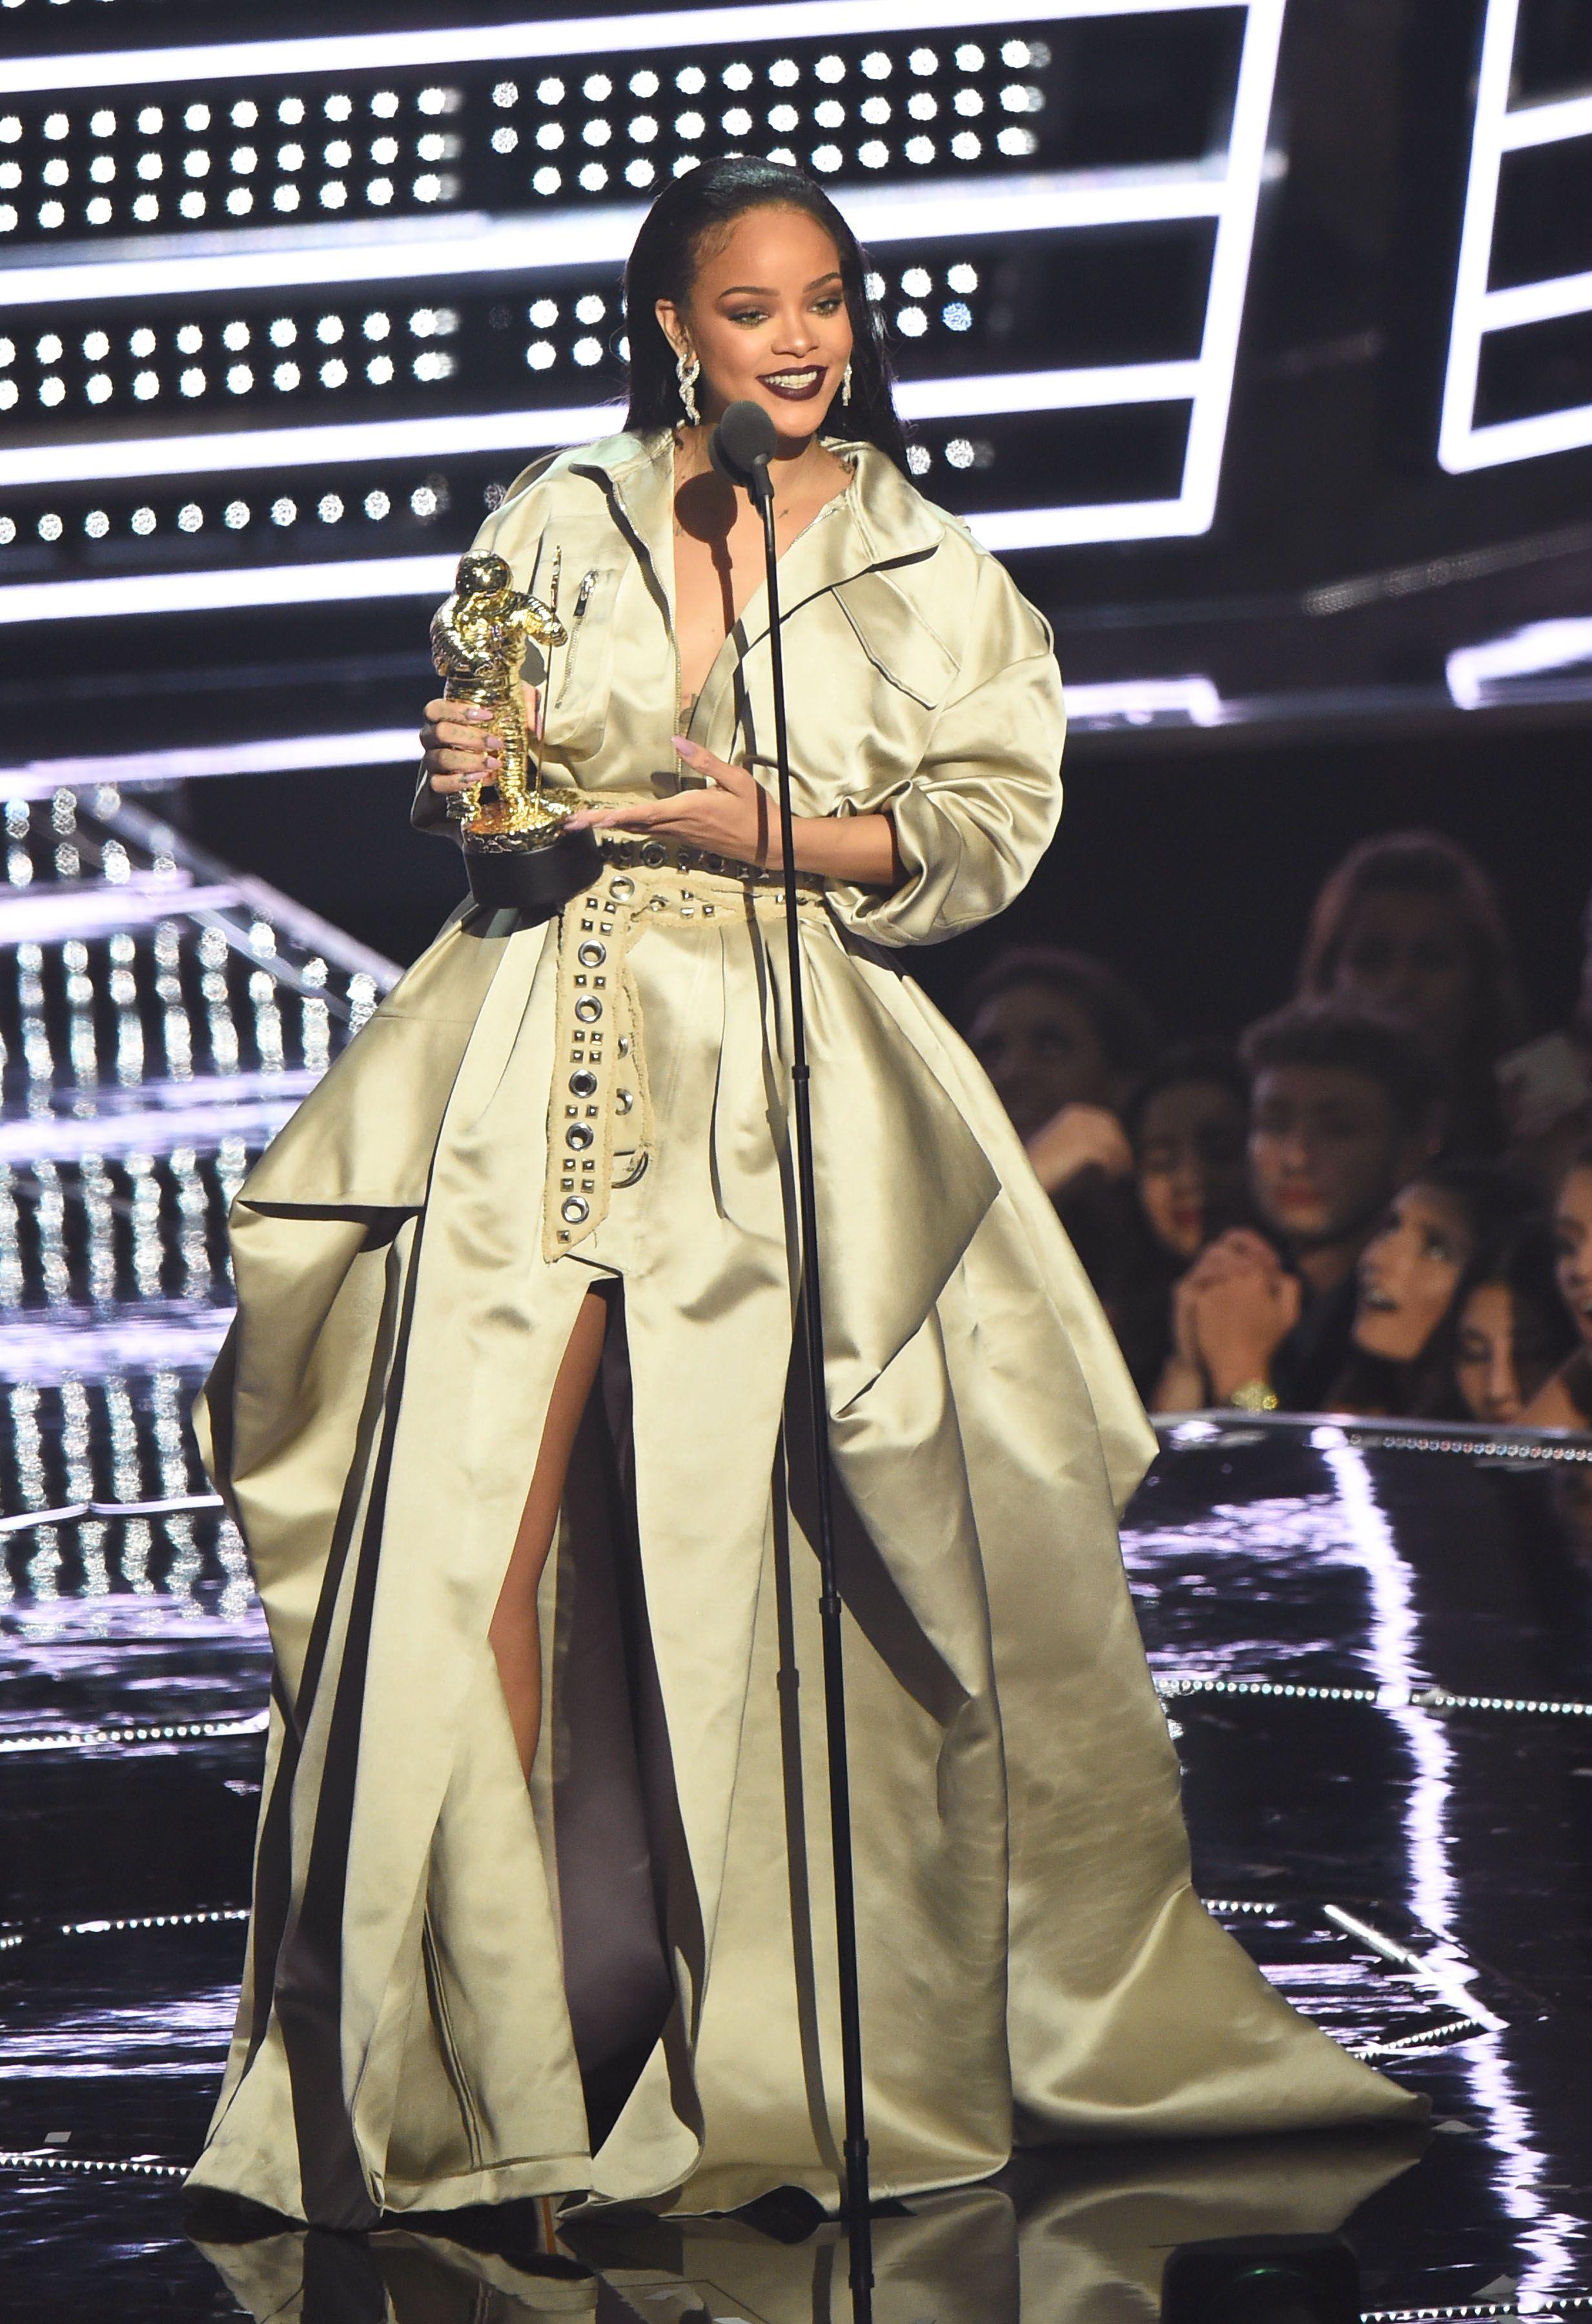 Os Looks Superfashionistas De Rihanna No Vma 2016 Outfits Stil Stile